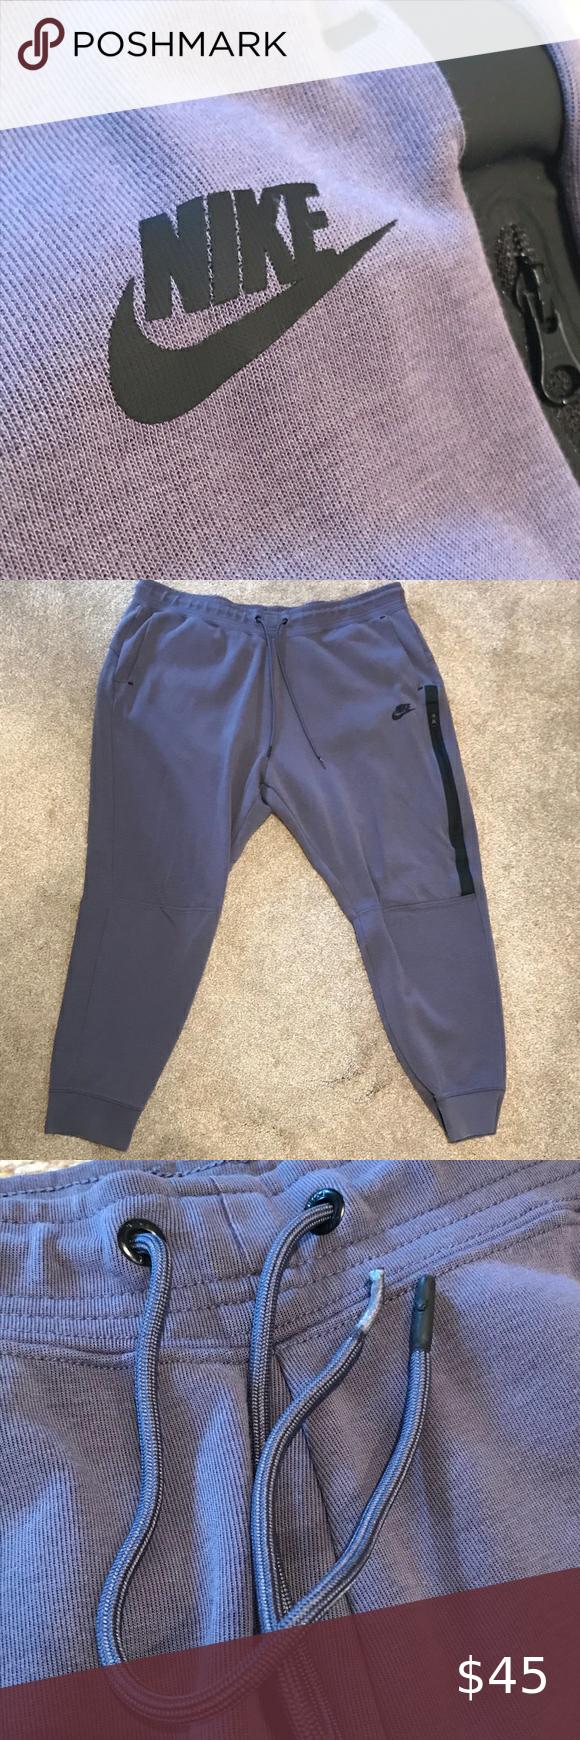 Nike Tech Fleece, Plus Size, Blue/Grey These sweatpants